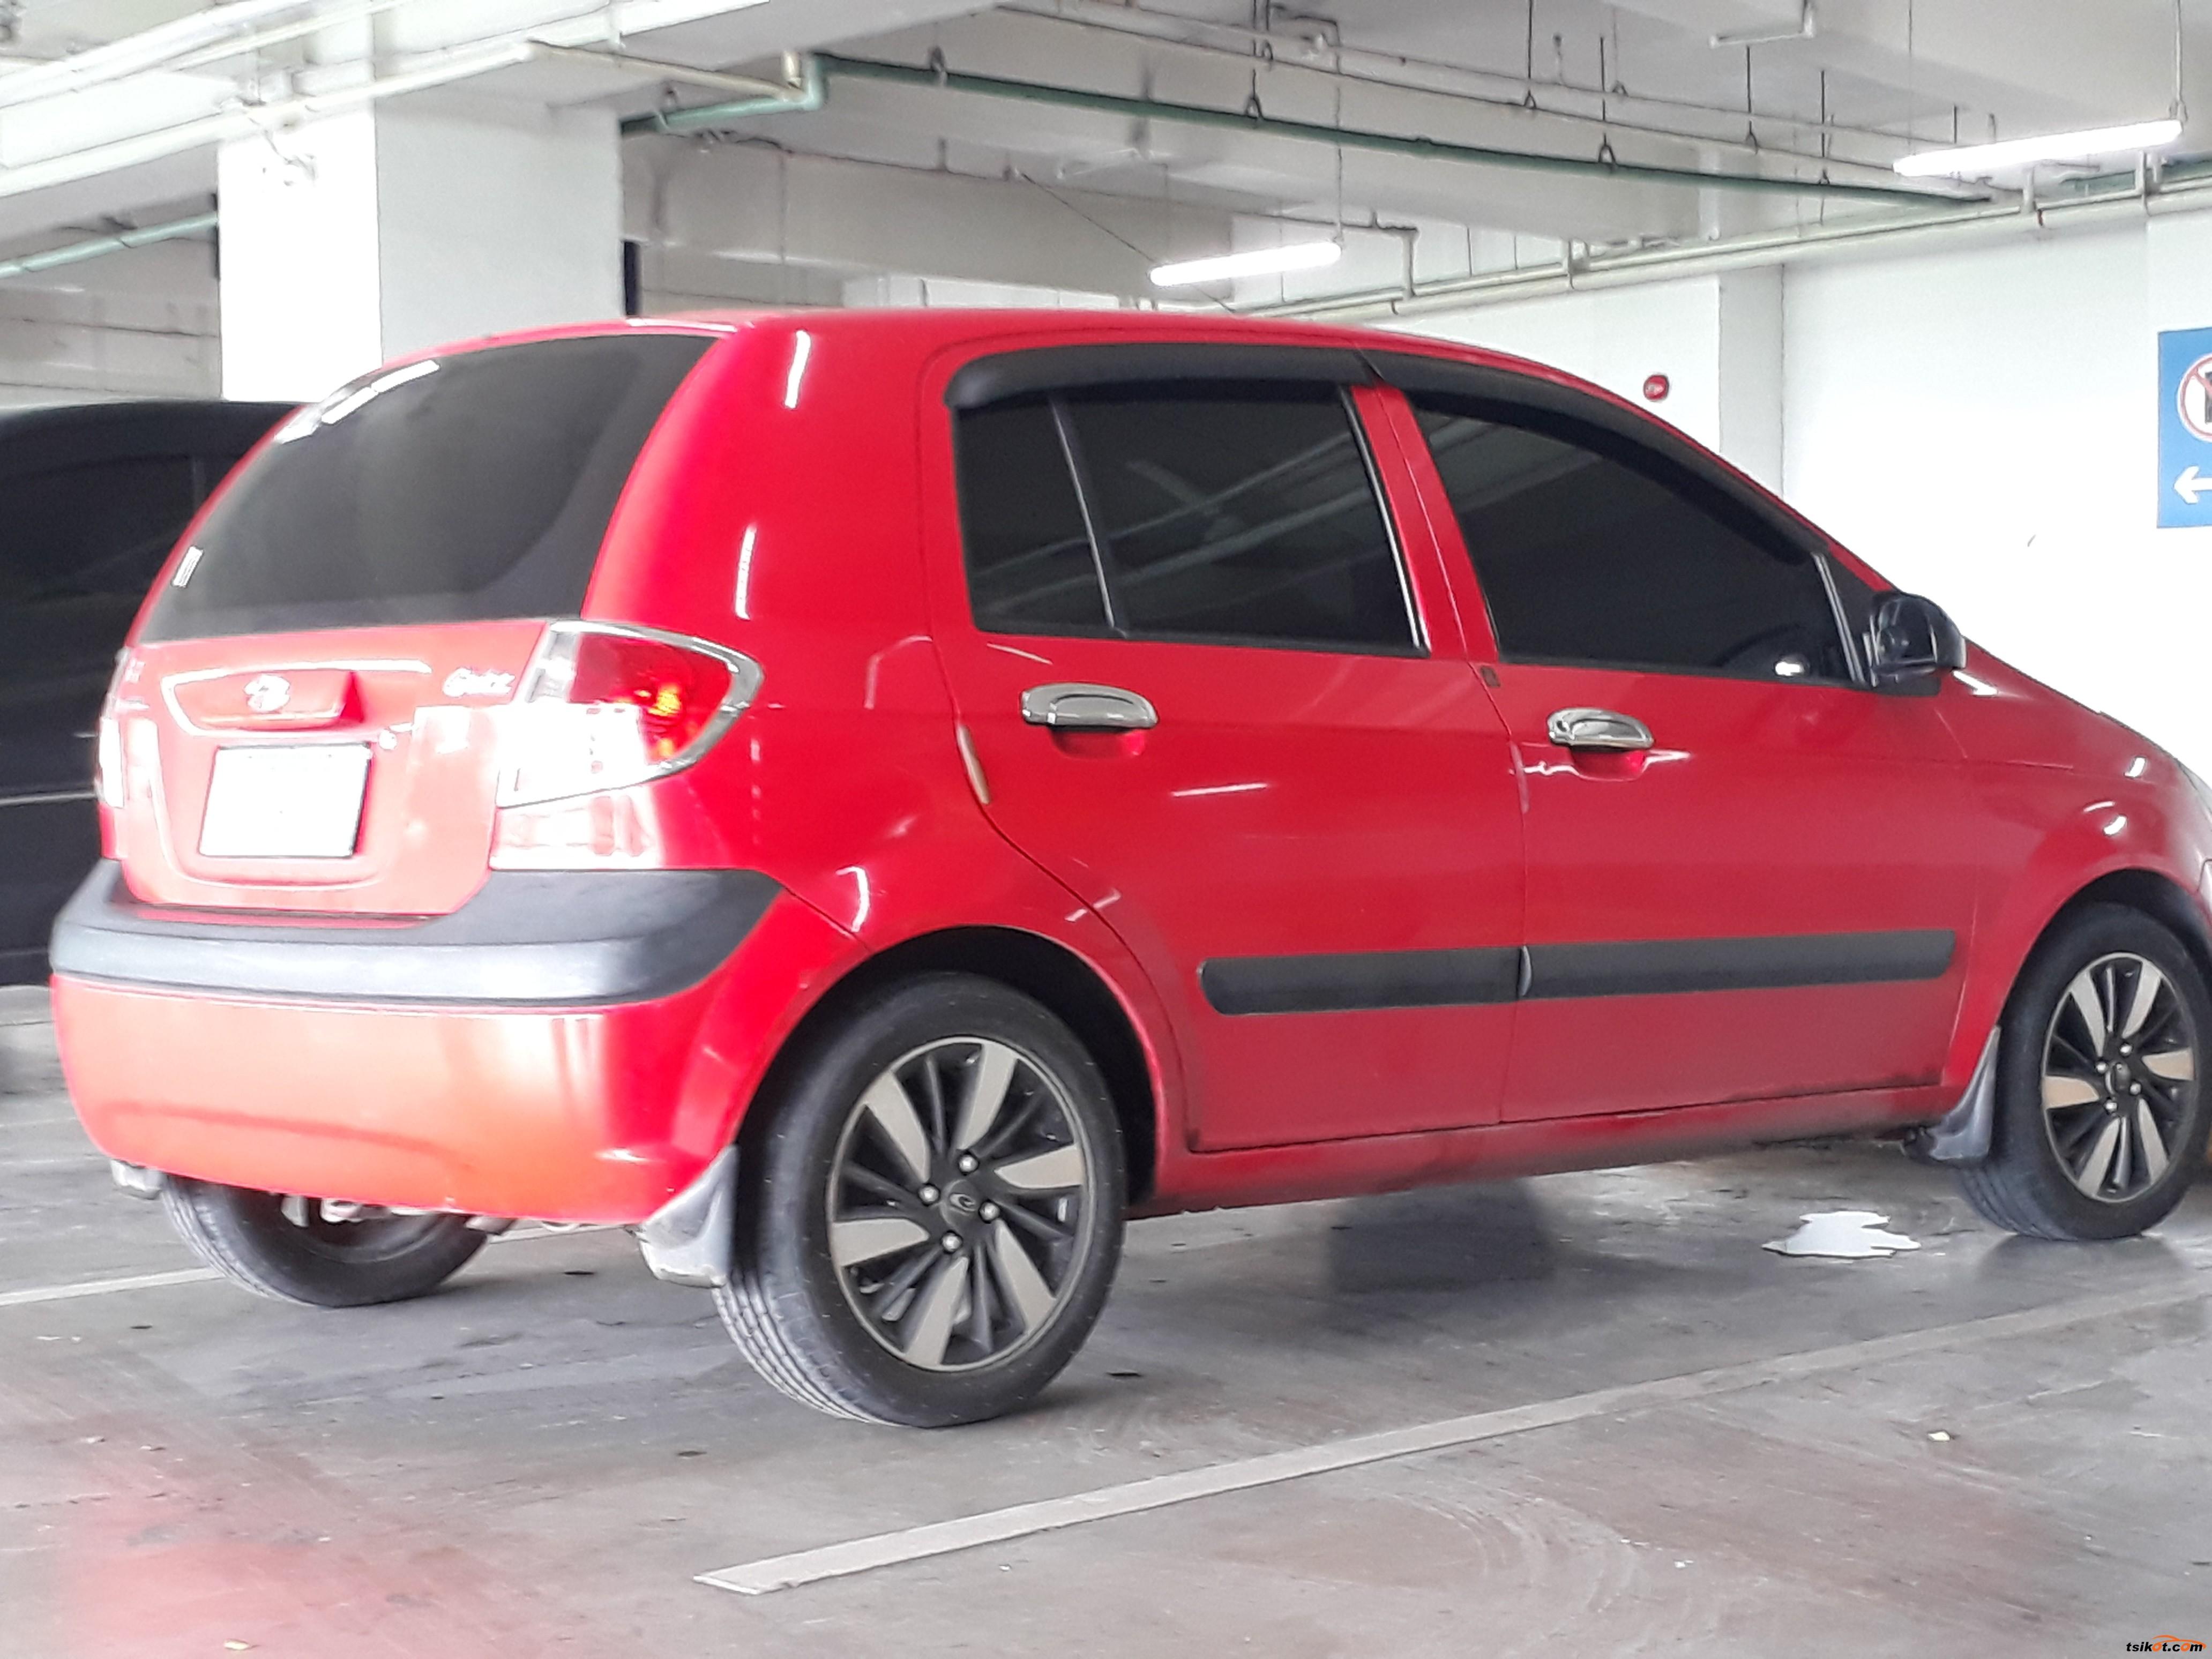 Hyundai Getz 2009 - 4